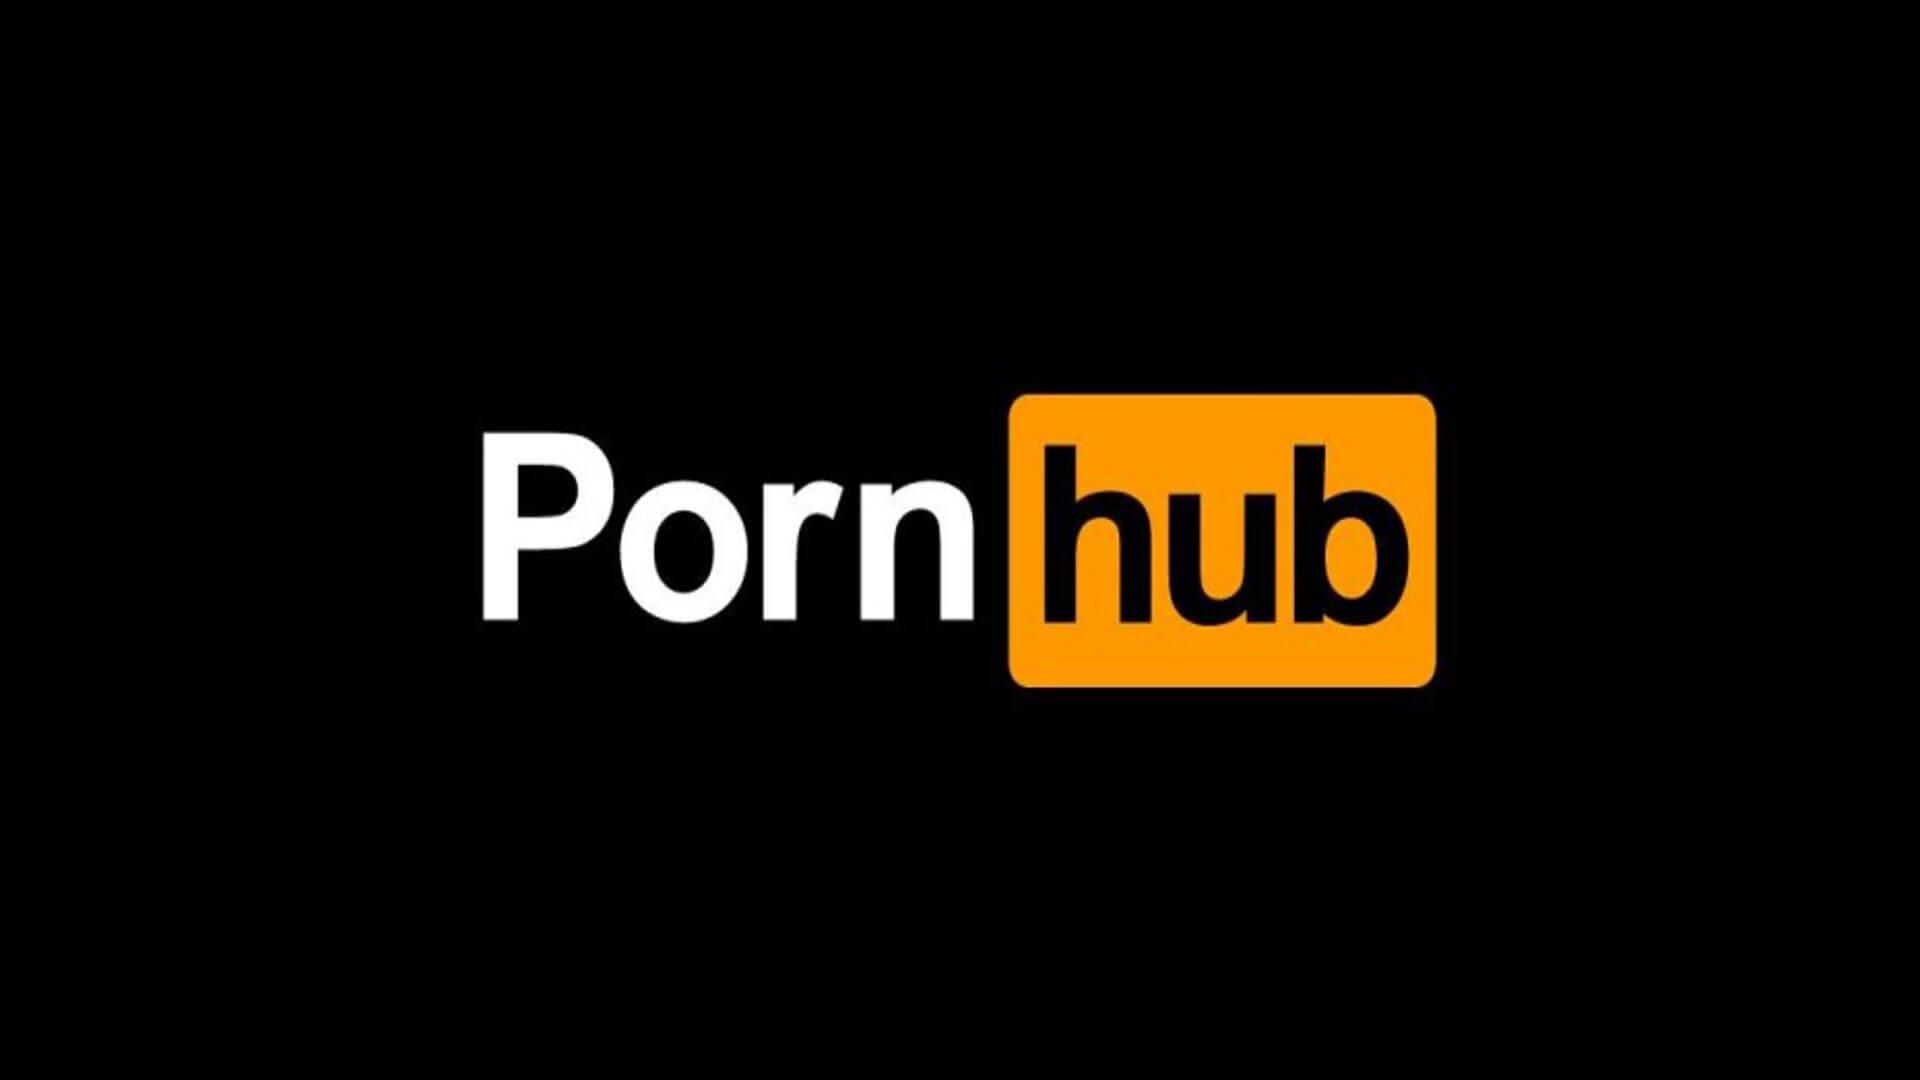 Pornhub dropped an album for Valentine's Day?! WTF